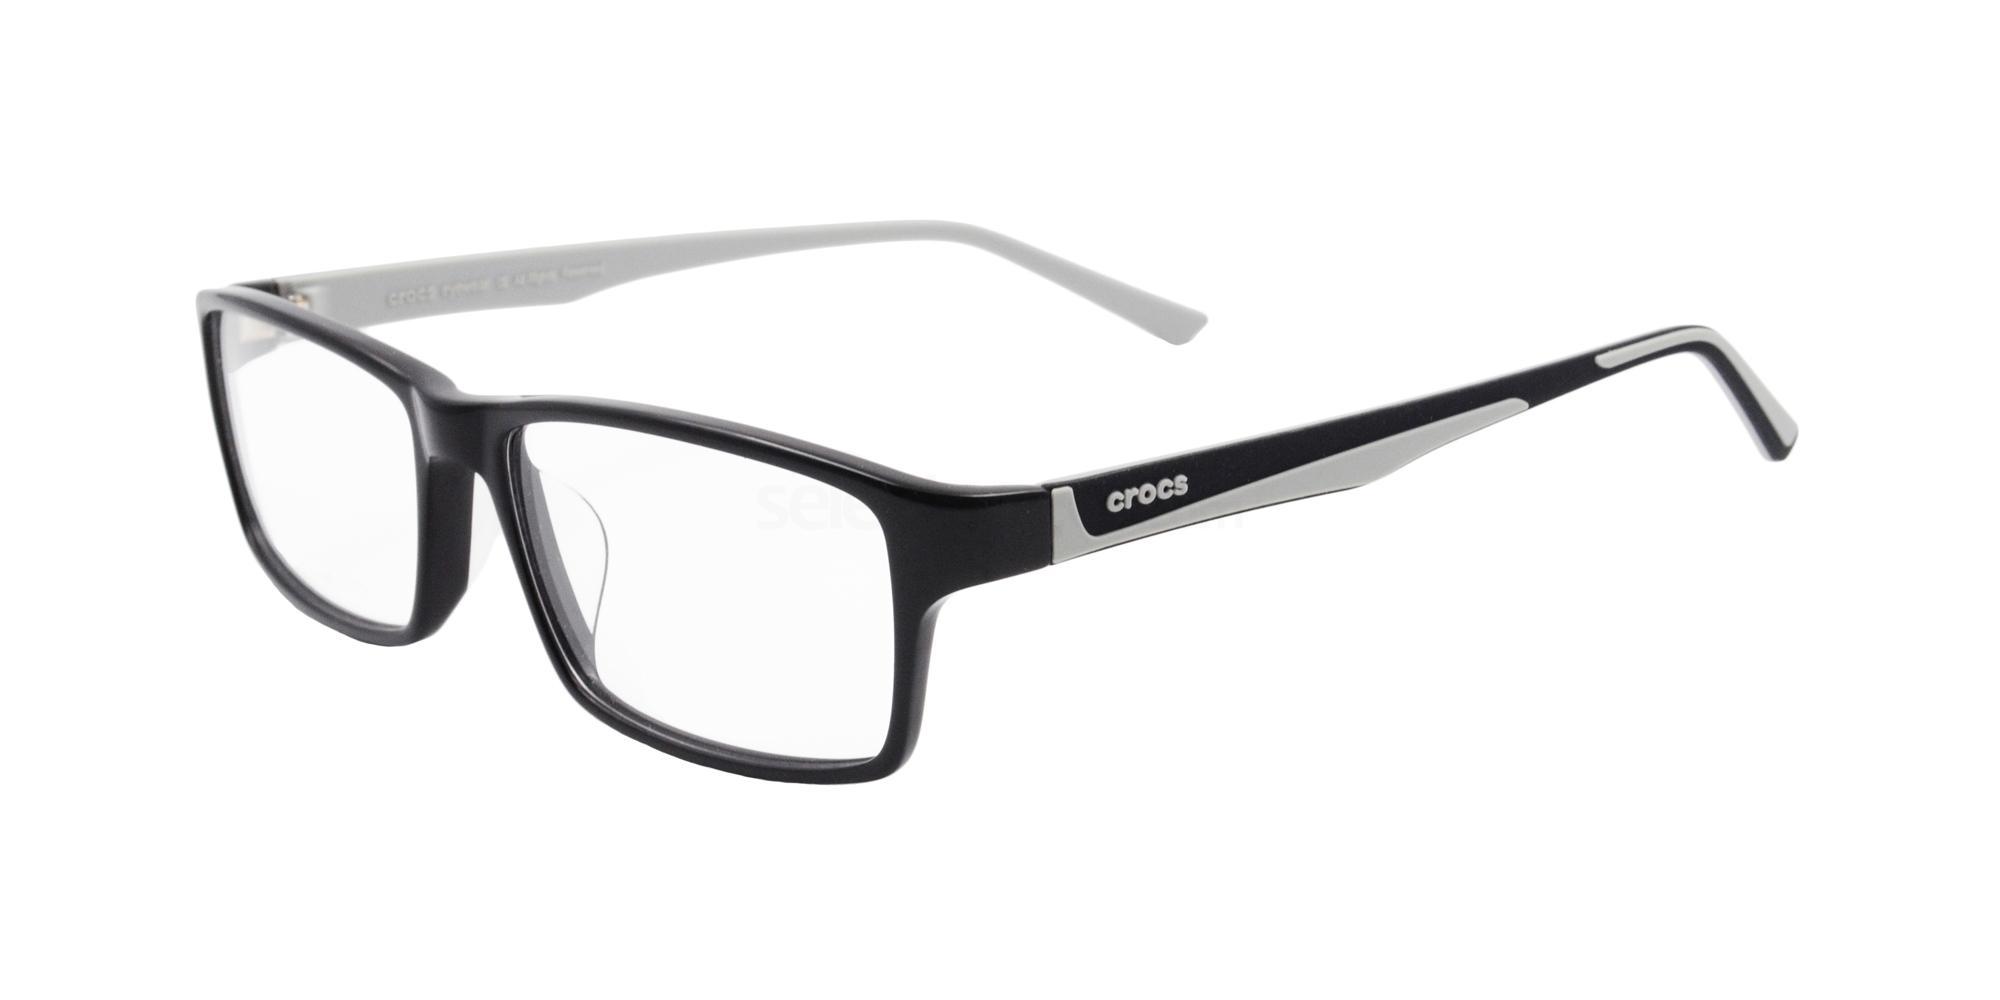 20GY CF3013 Glasses, Crocs Eyewear